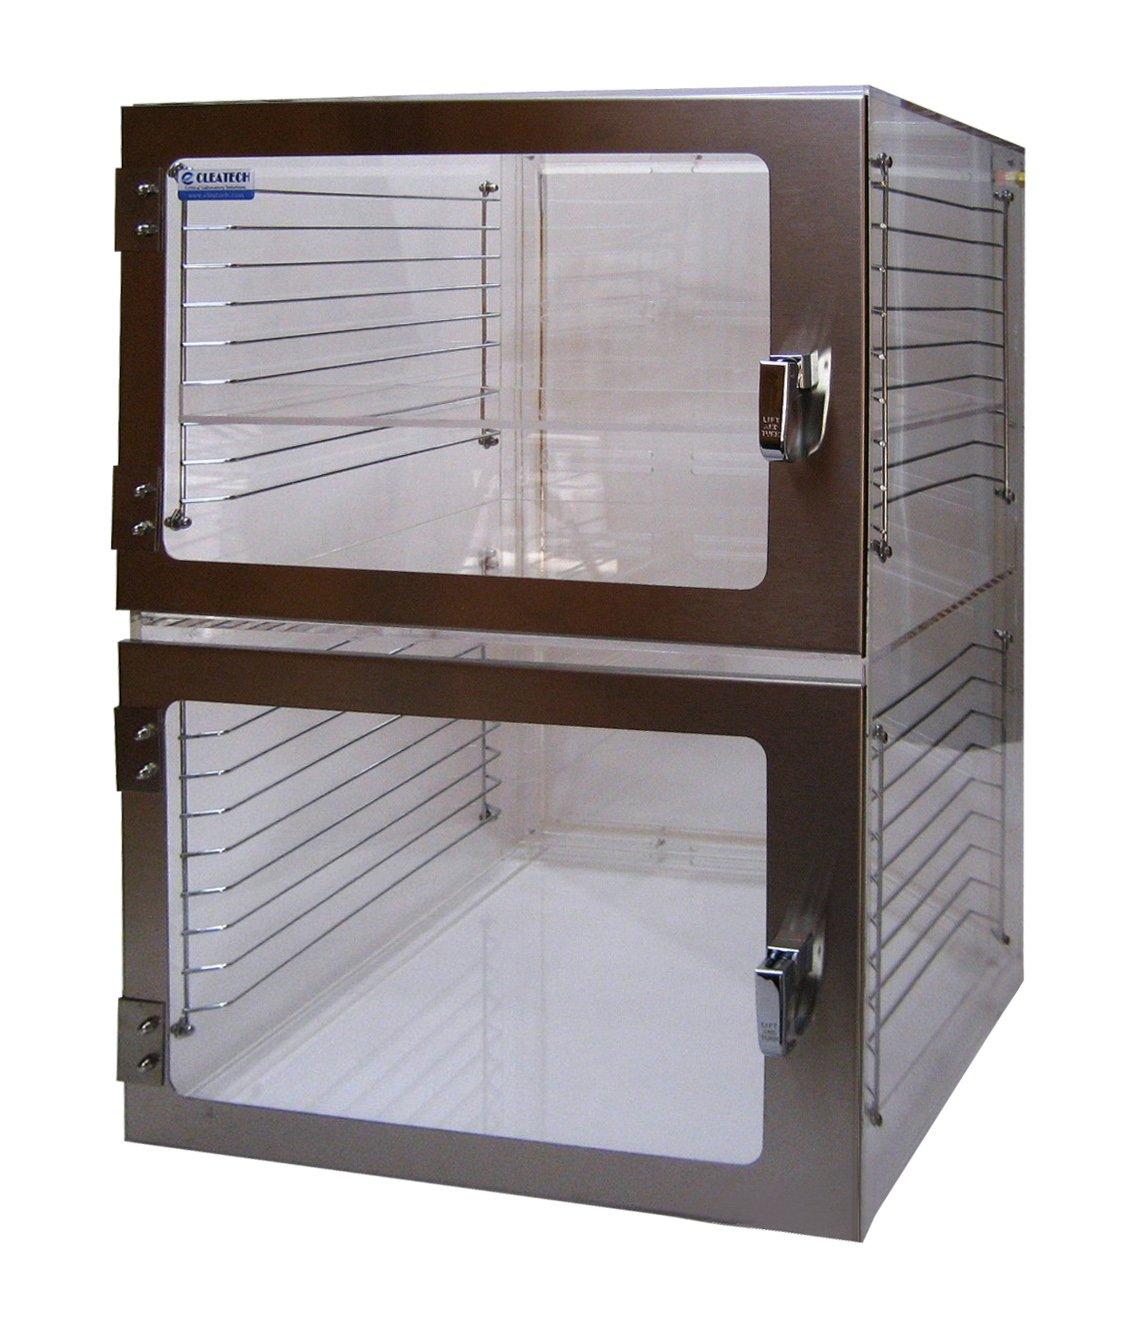 Nitrogen Desiccator Cabinet OFFicial site 24x18x32 Boston Mall